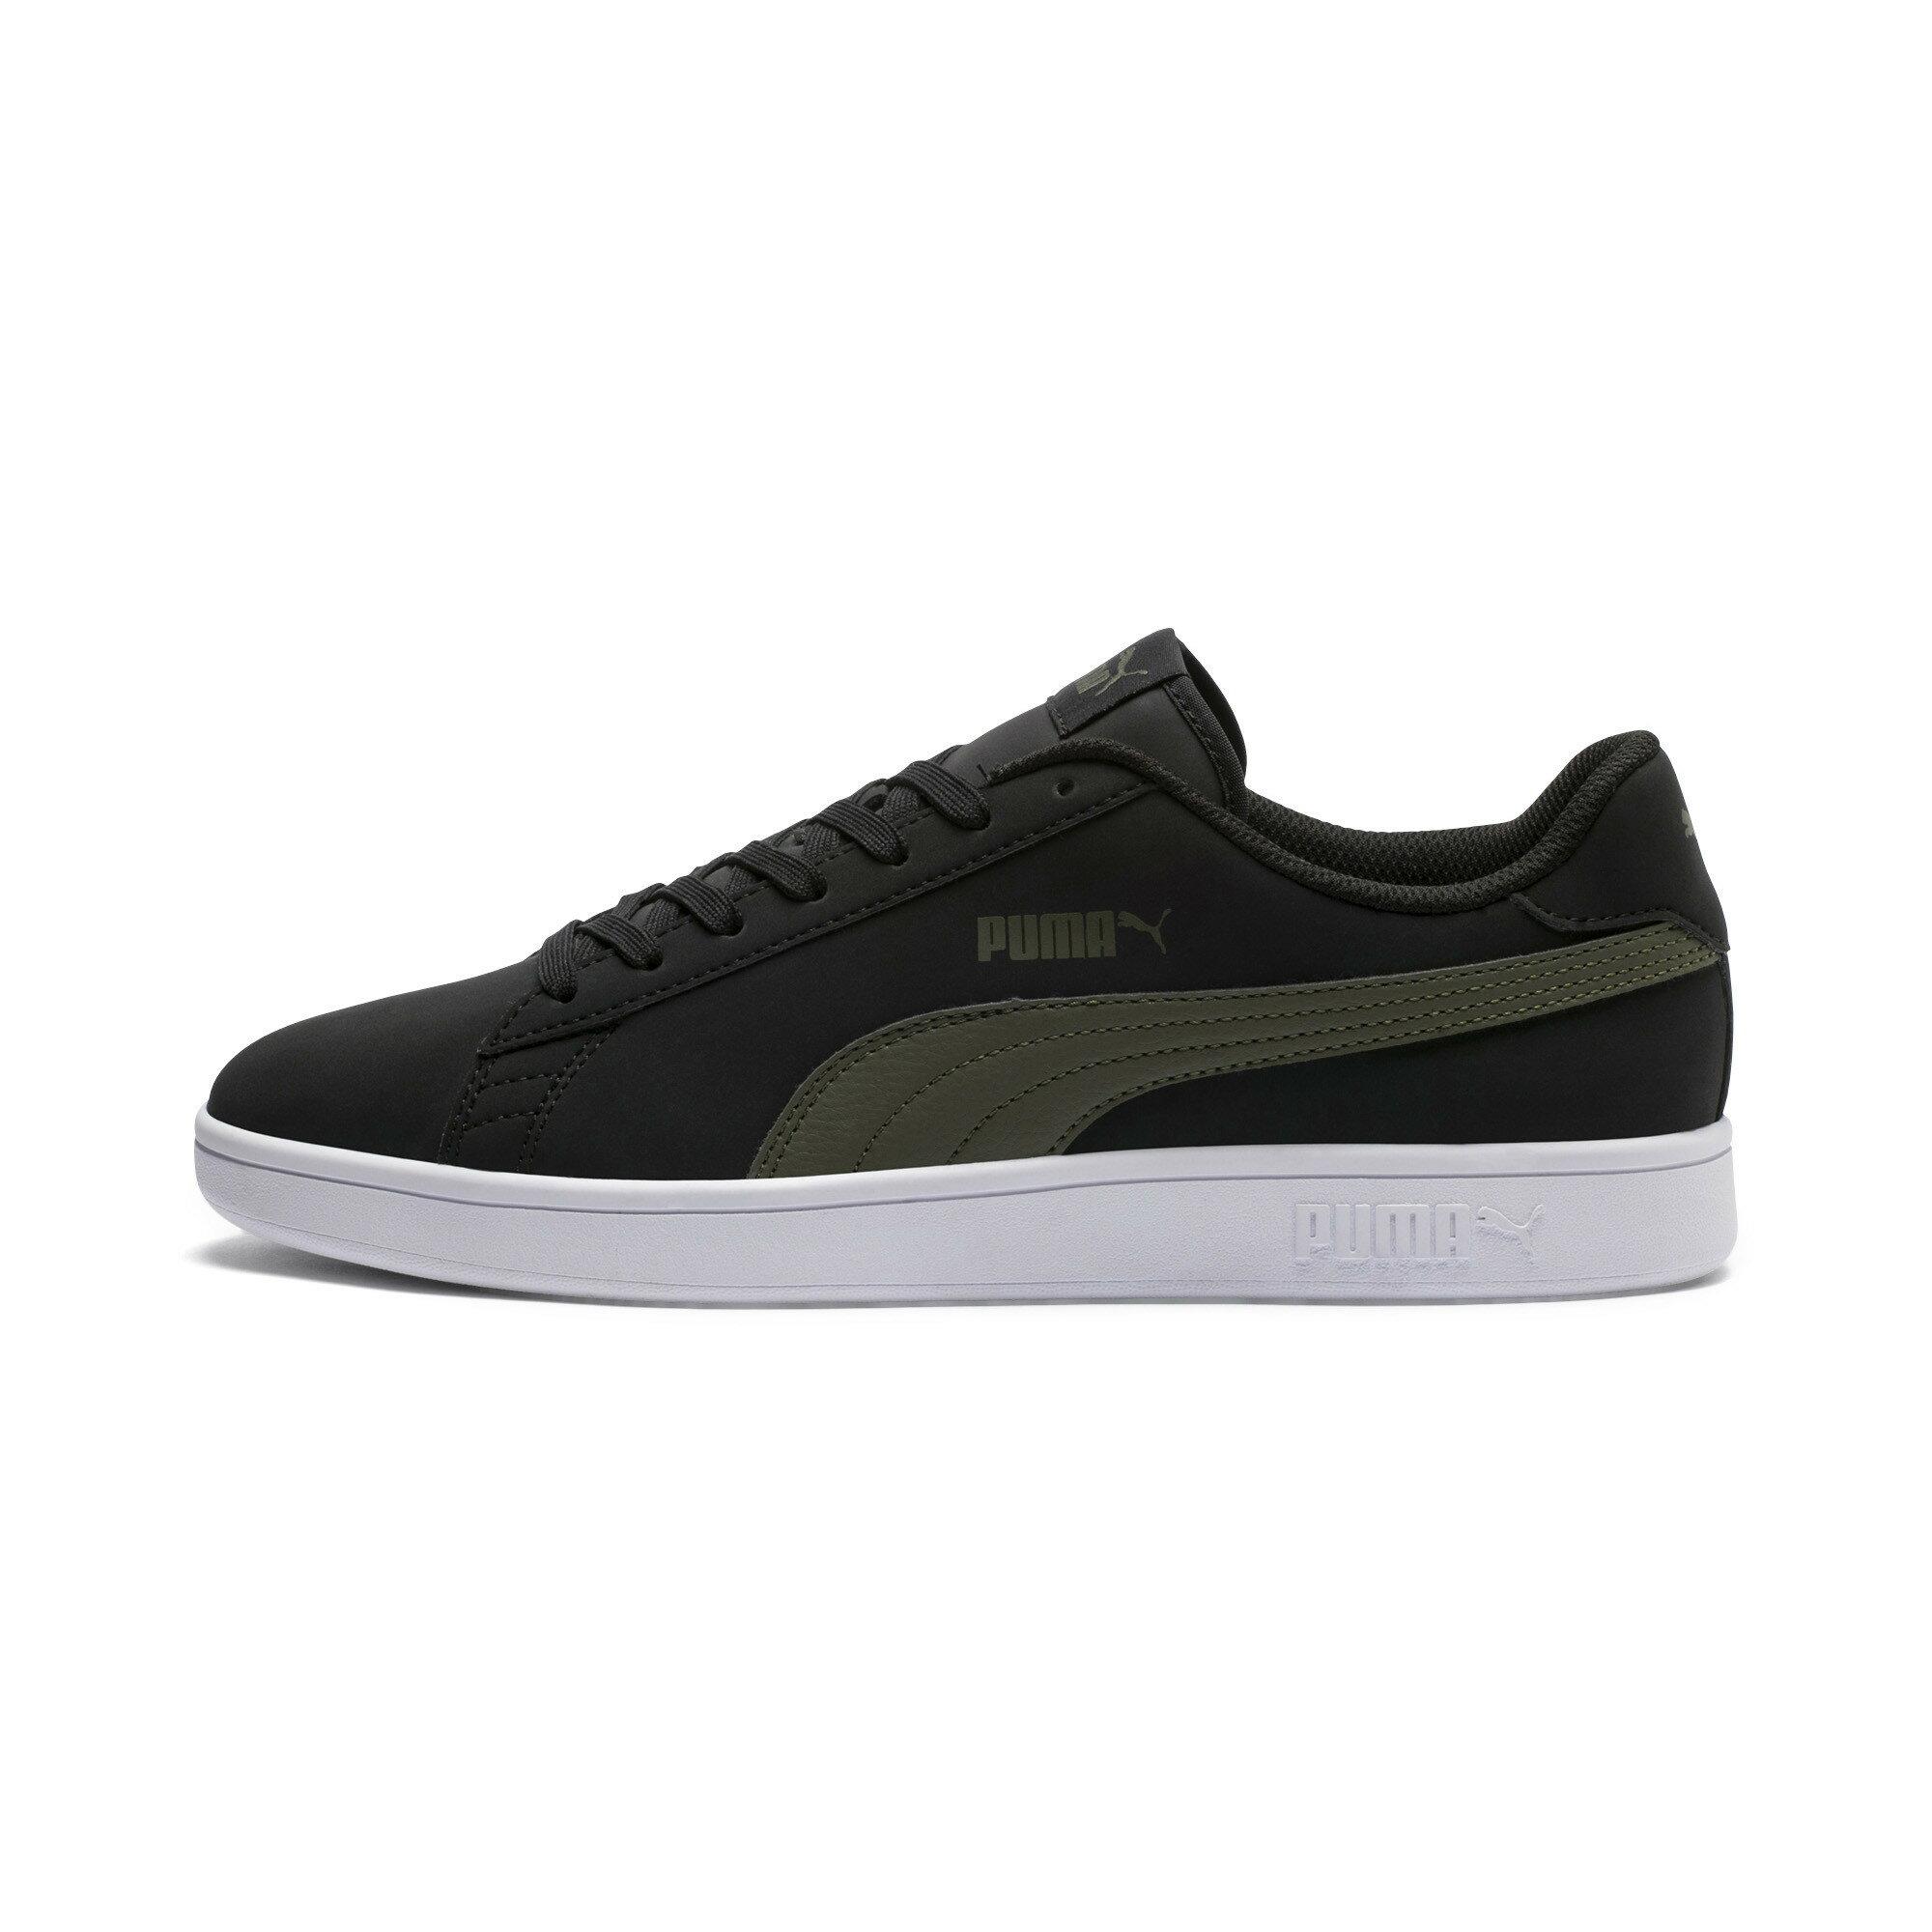 d0abead99f1513 Official Puma Store  PUMA Smash V2 Buck Sneakers